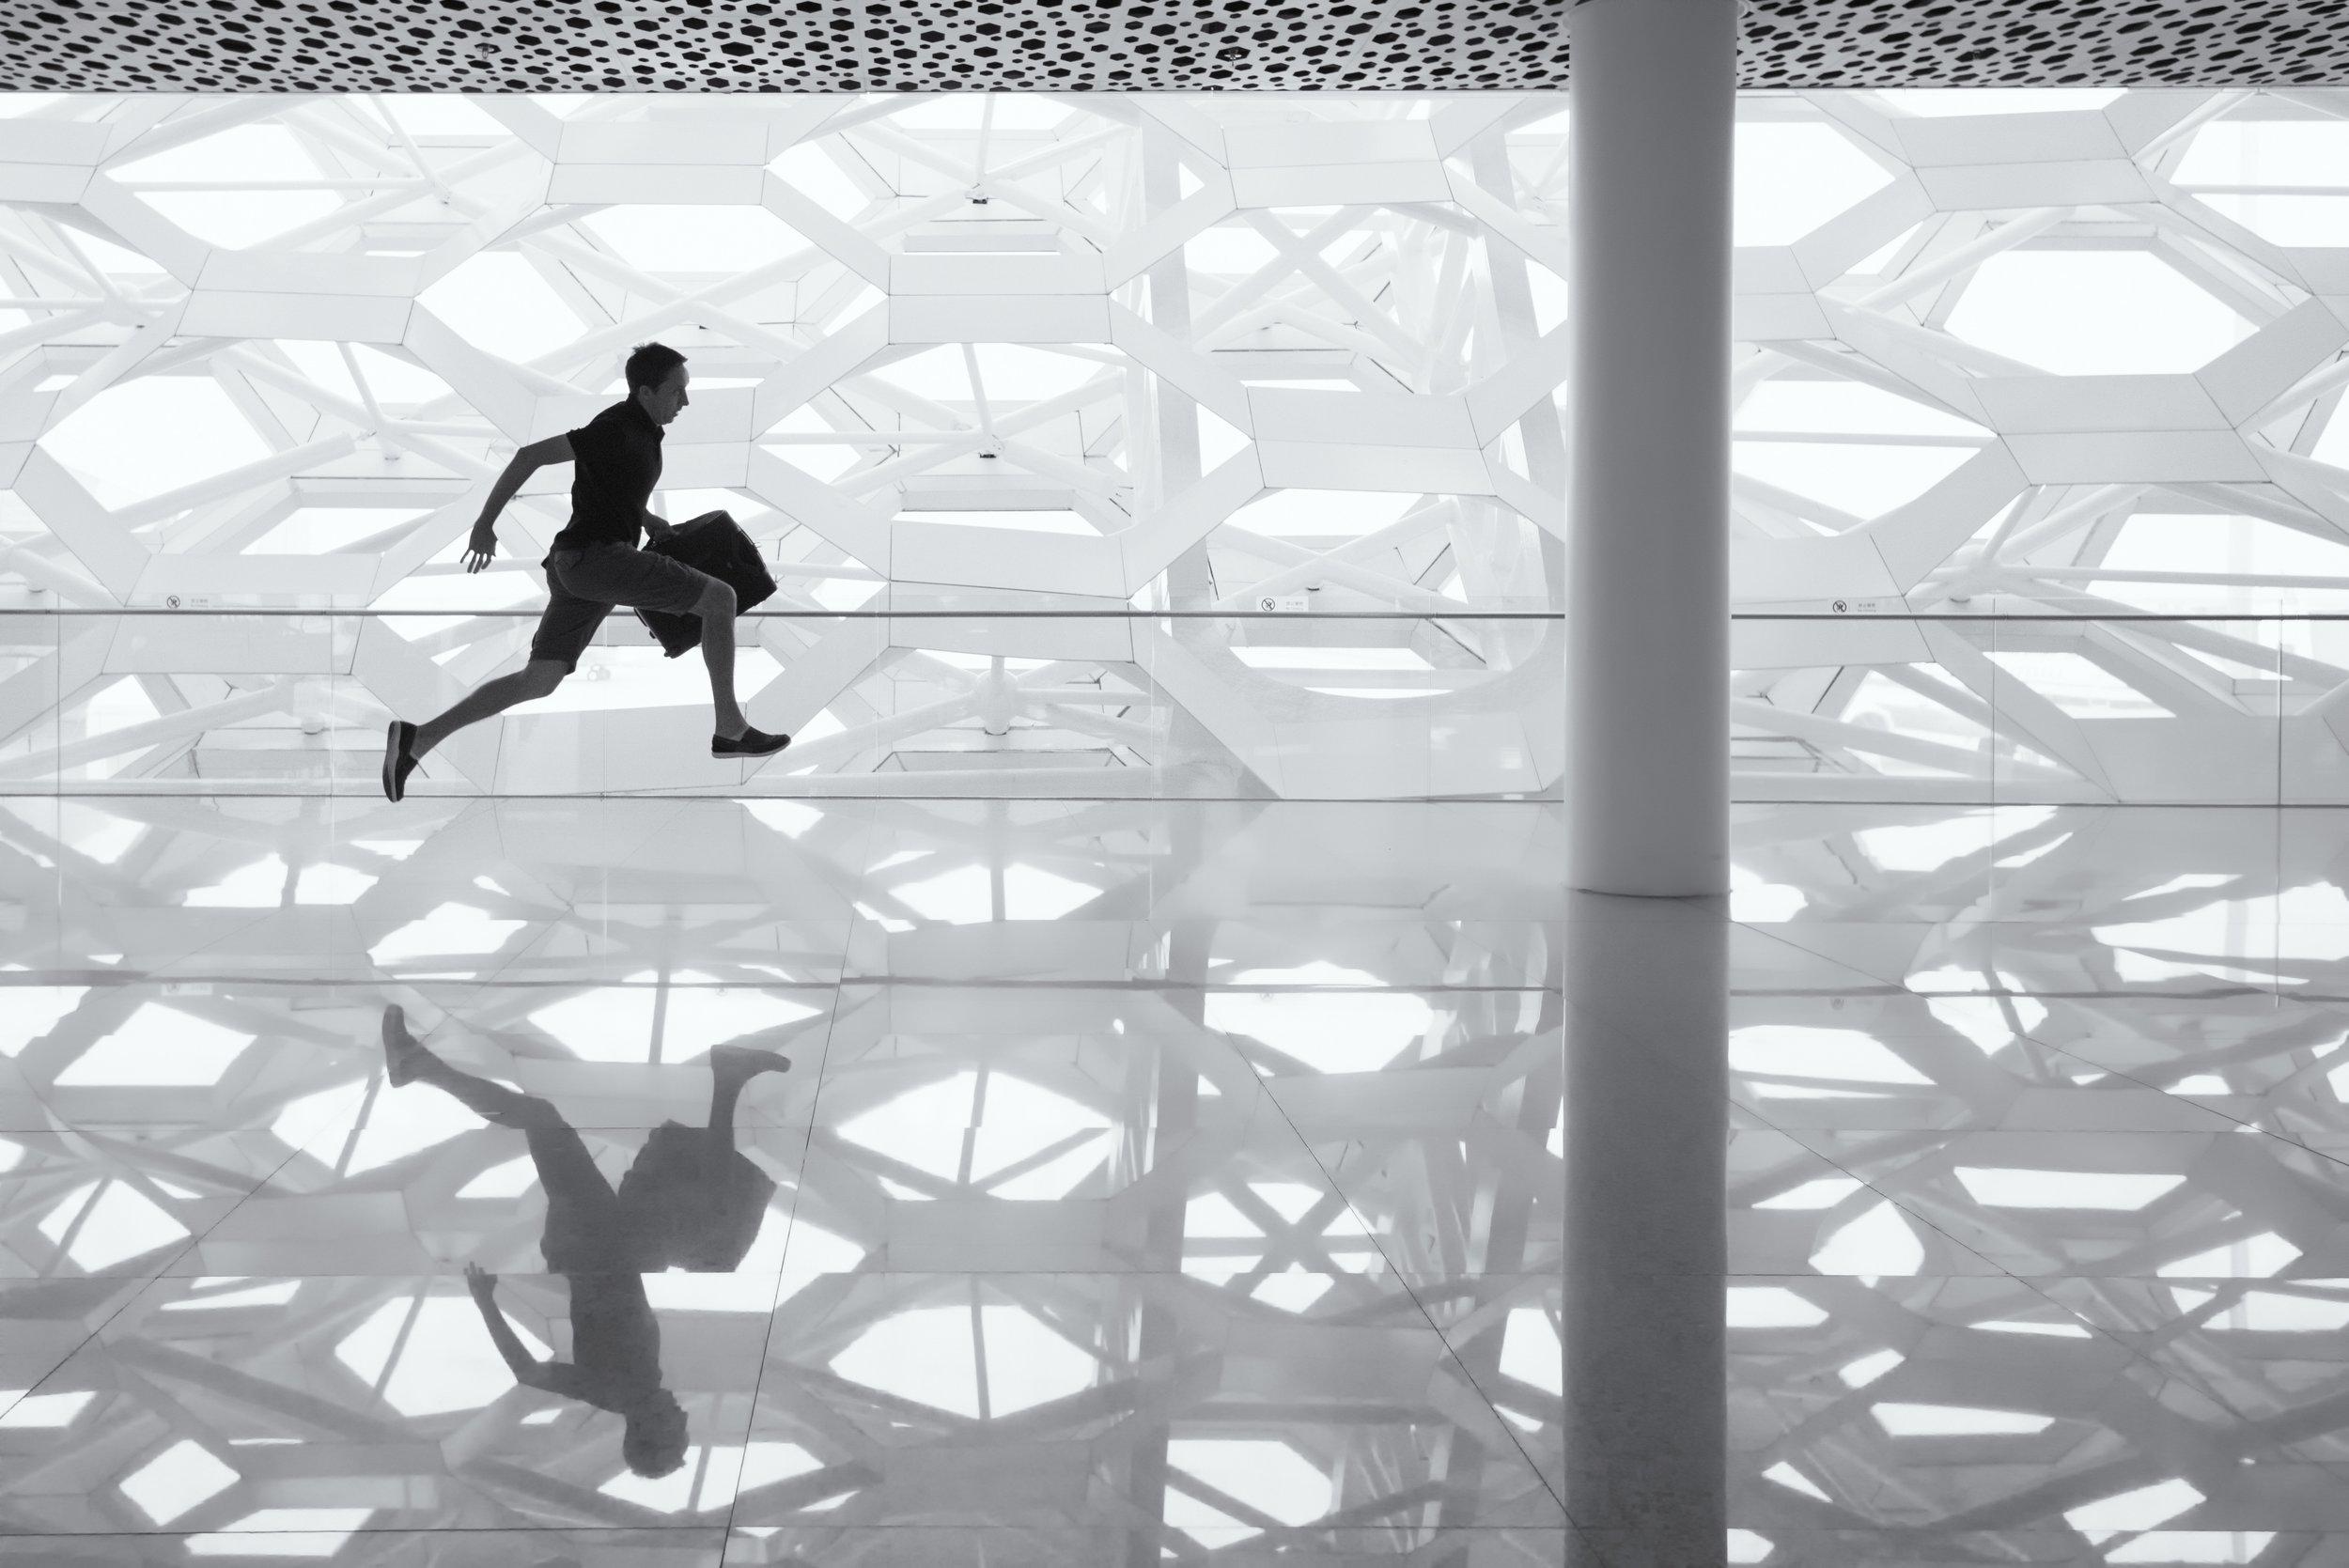 man with briefcase runs through office building